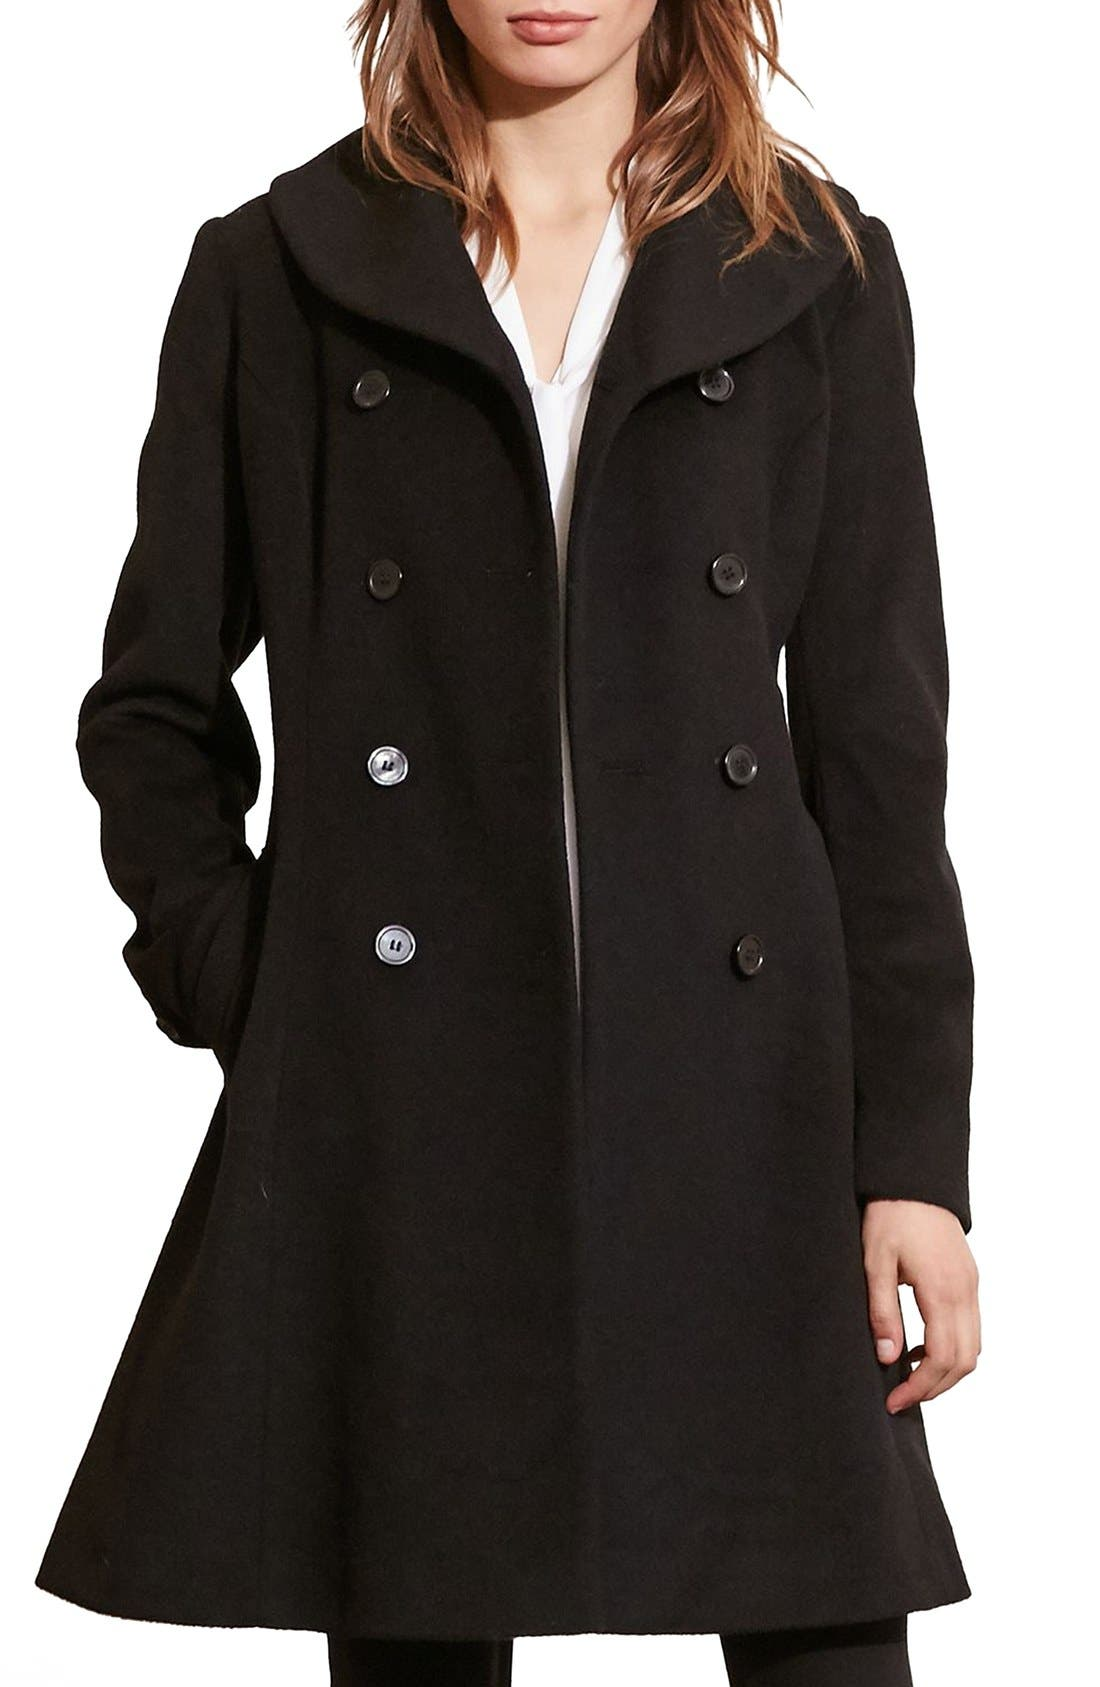 Alternate Image 1 Selected - Lauren Ralph Lauren Fit & Flare Military Coat